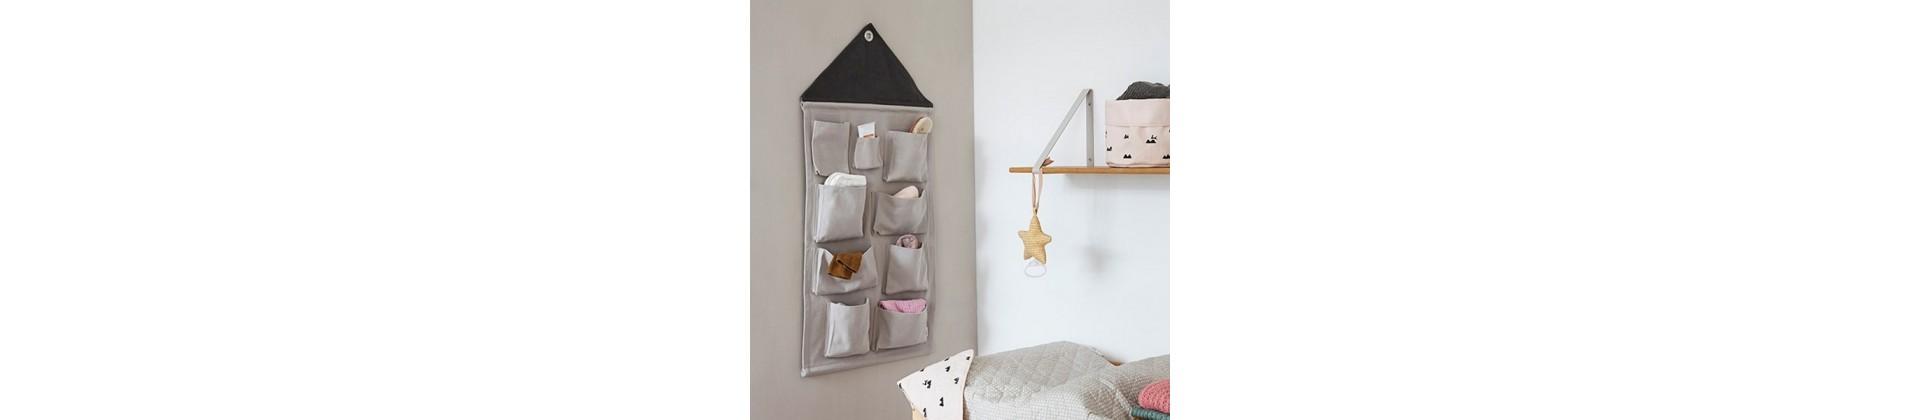 Baby accessories - Newborn essentials & baby products France